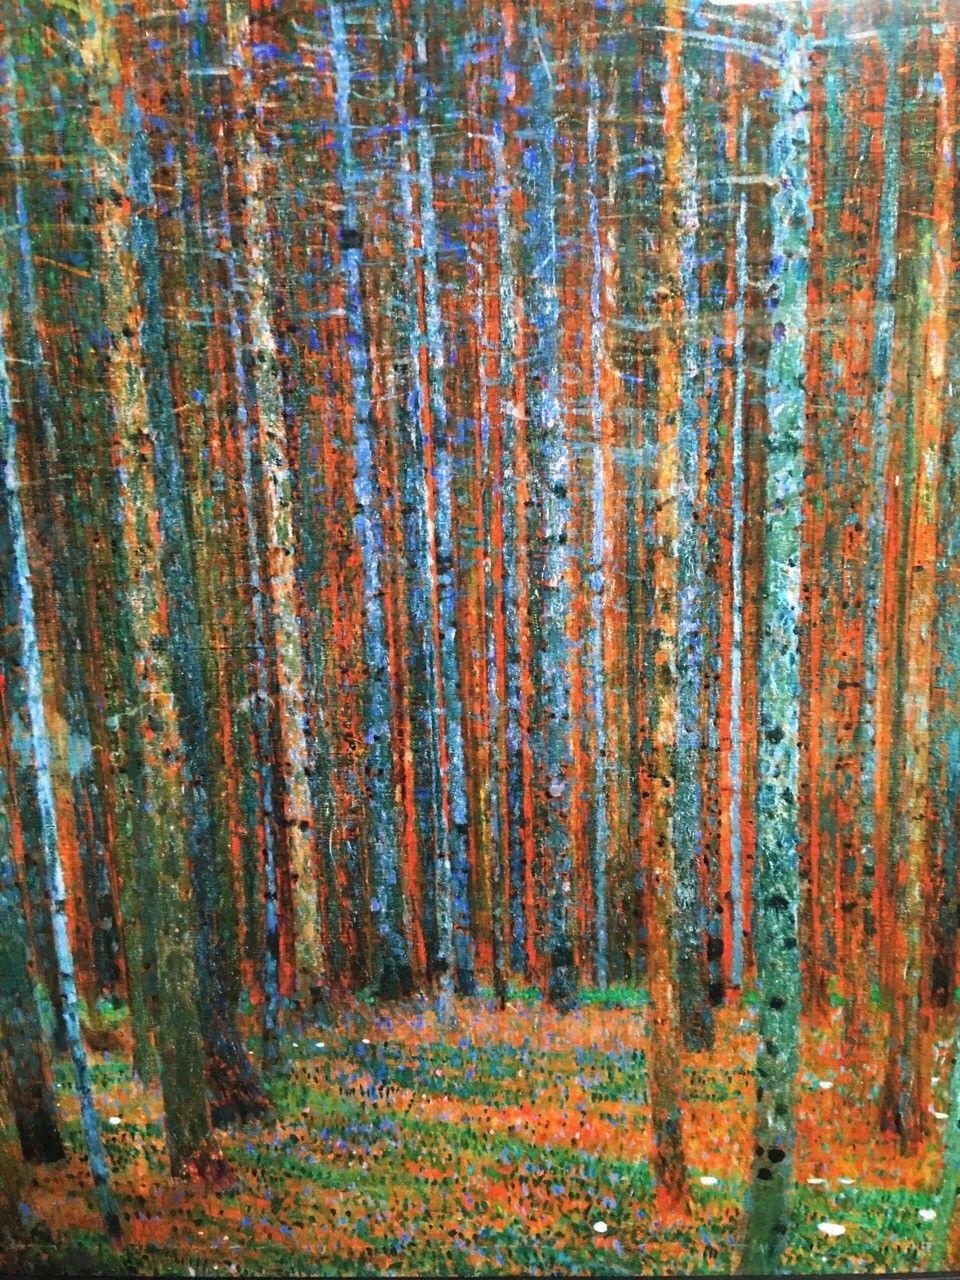 Gustav Klimt Tannenwald (Pine Forest), 1902 med ramme - Oslo  - Gustav Klimt Tannenwald (Pine Forest), 1902   Vare # : 2586049 kjøpt på Allposters.com Rammelist: Hampton Black Wide Glass: Acrylic: Clear Giclee trykk Endelig størrelse: *65,7cmx67cm  Kjøpt på allposters. Med innrammi - Oslo